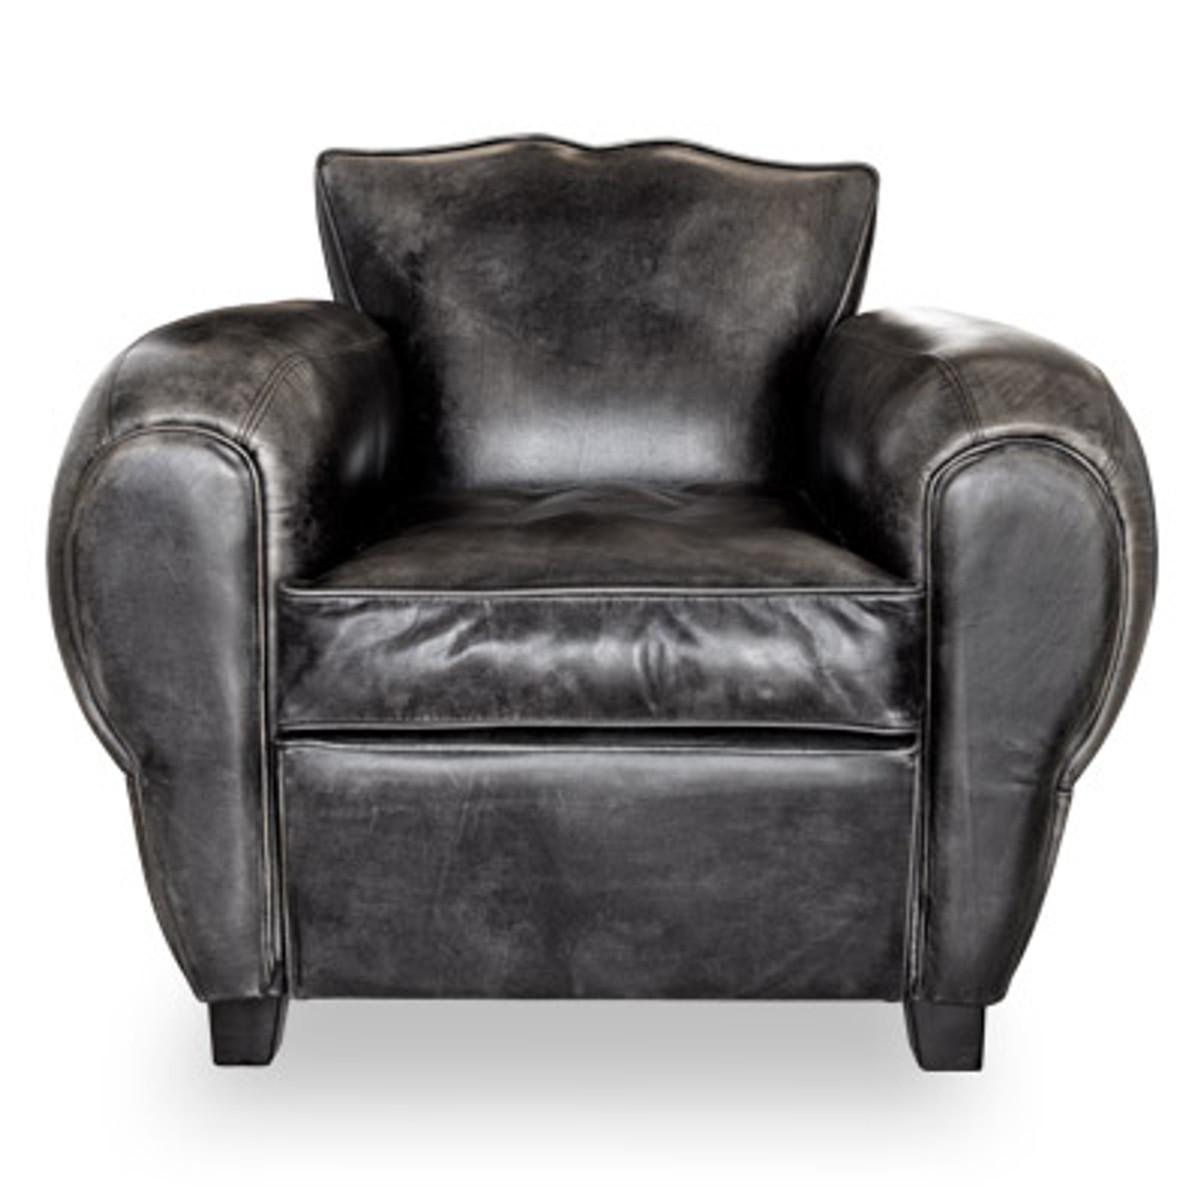 Art Deco Echtleder Sessel Buffalo Leder Antik Schwarz Clubsessel